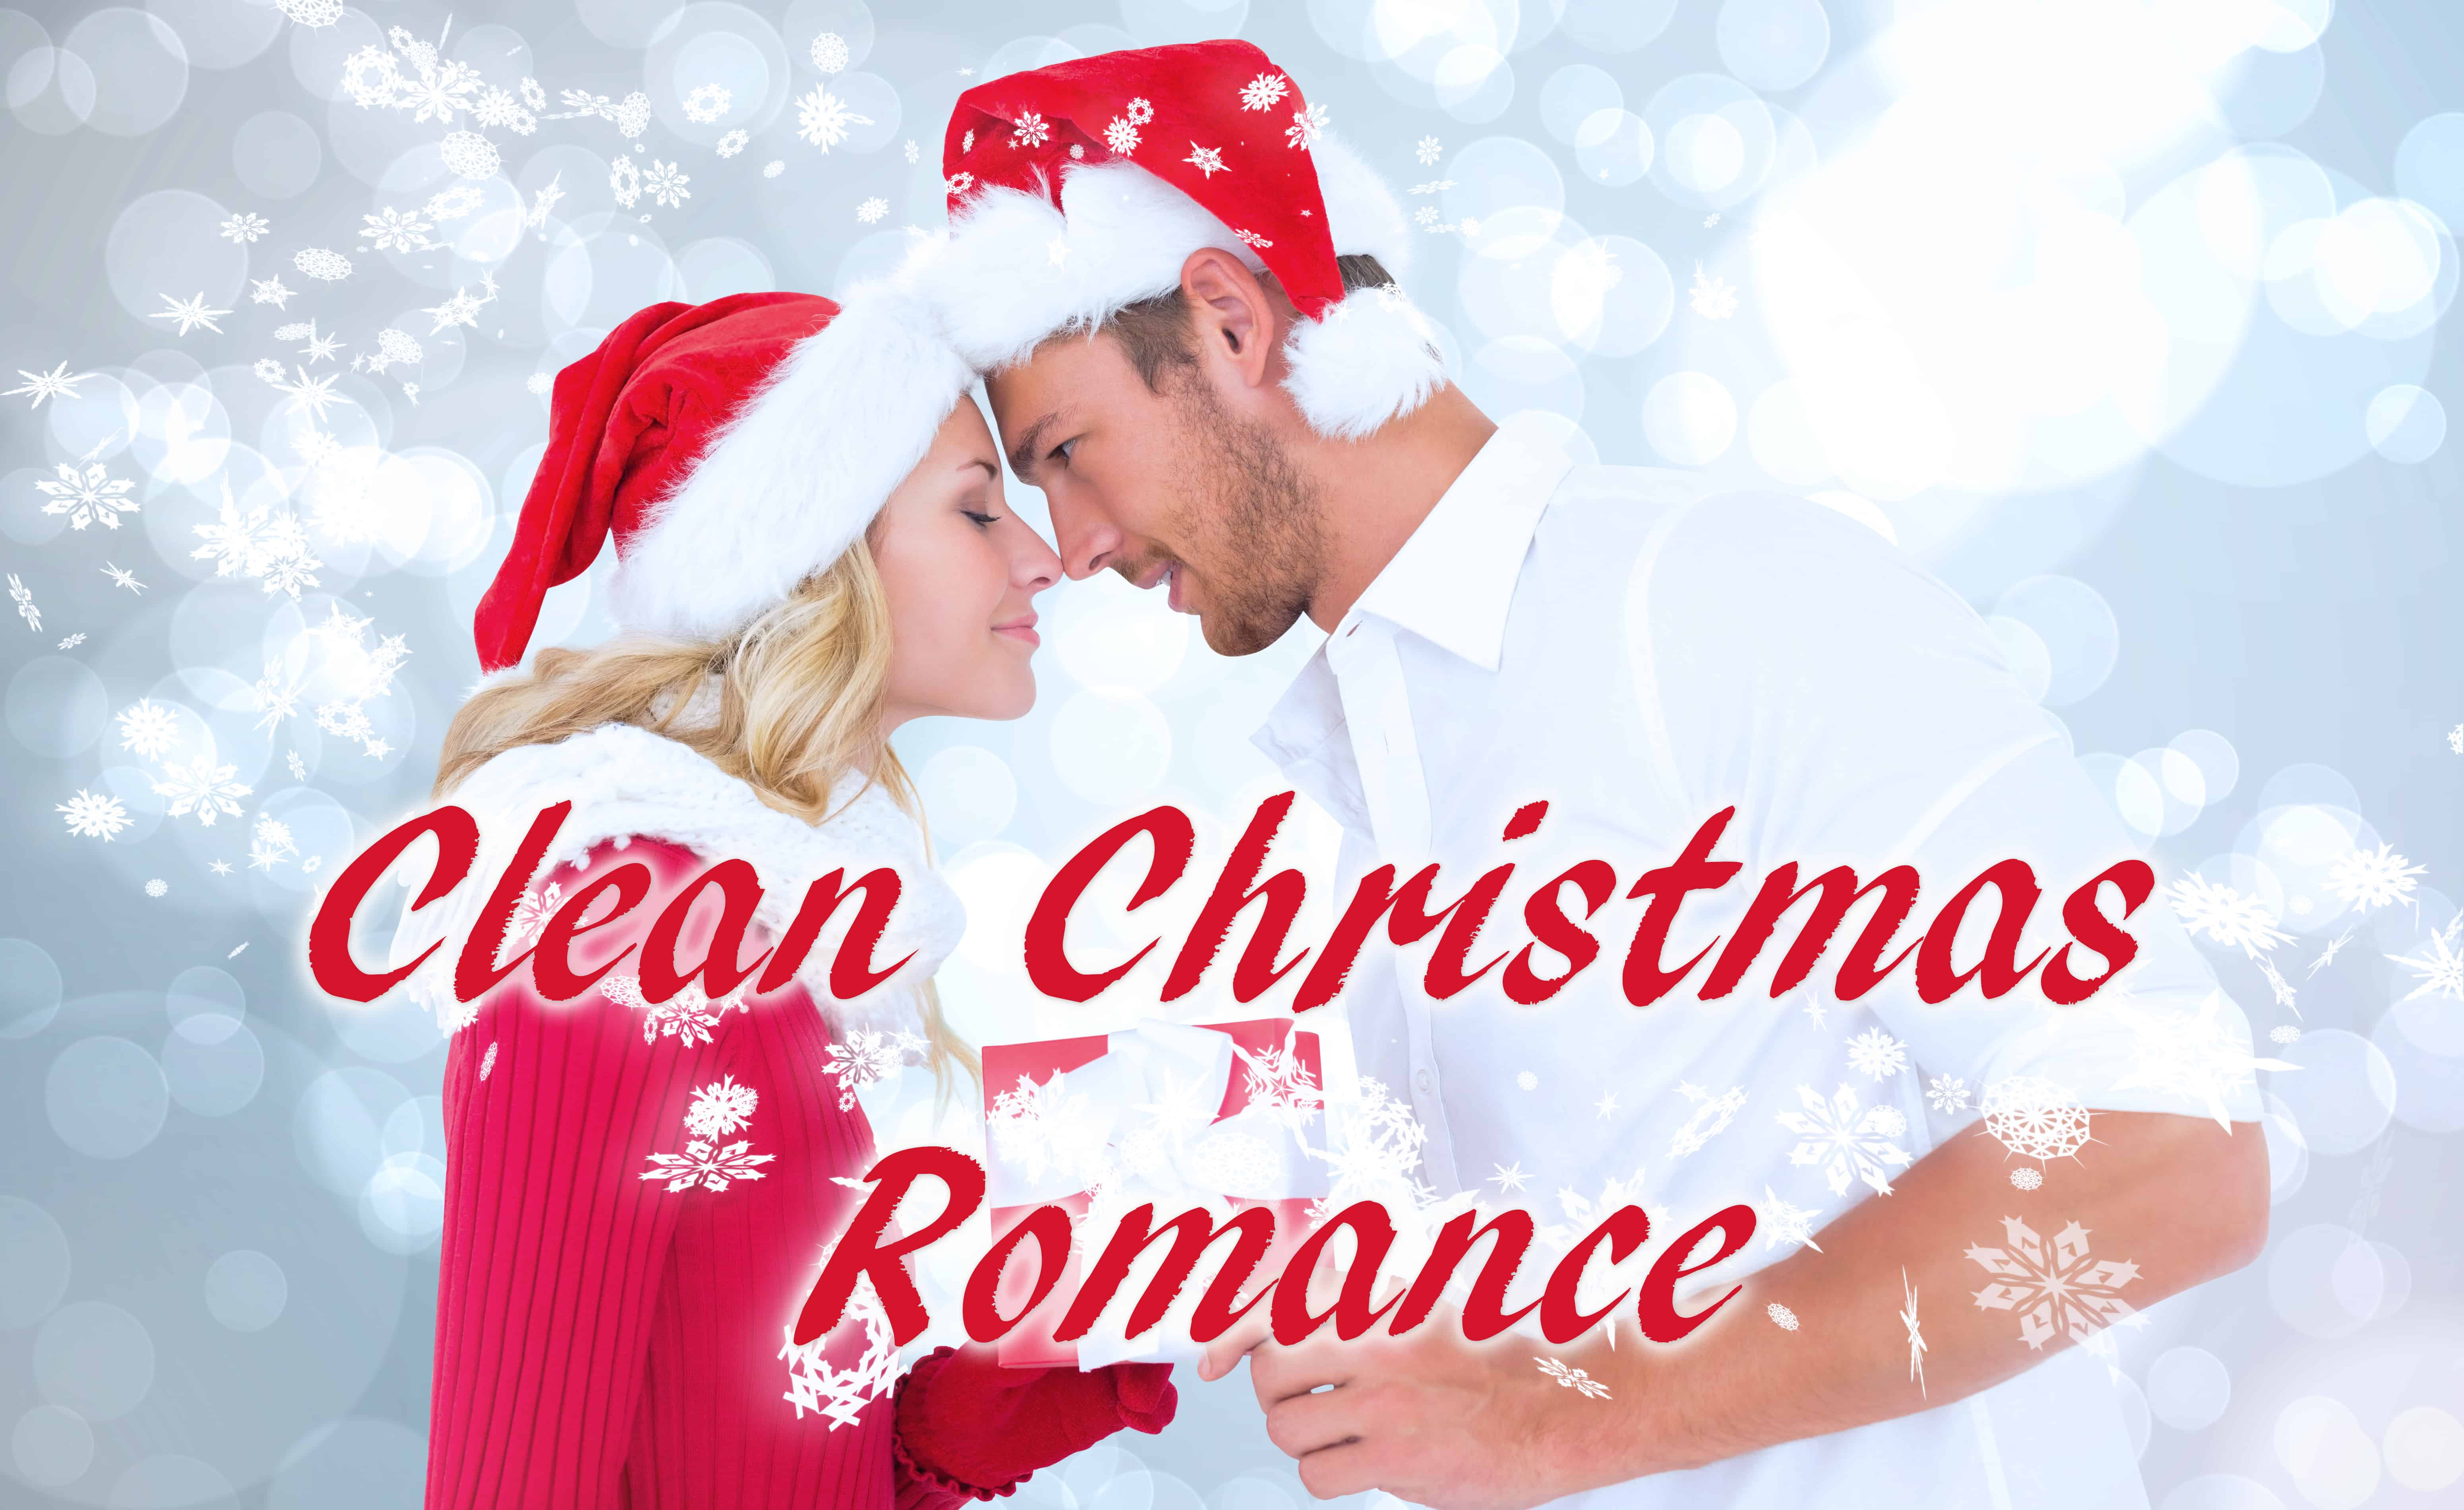 Clean Christmas Romance